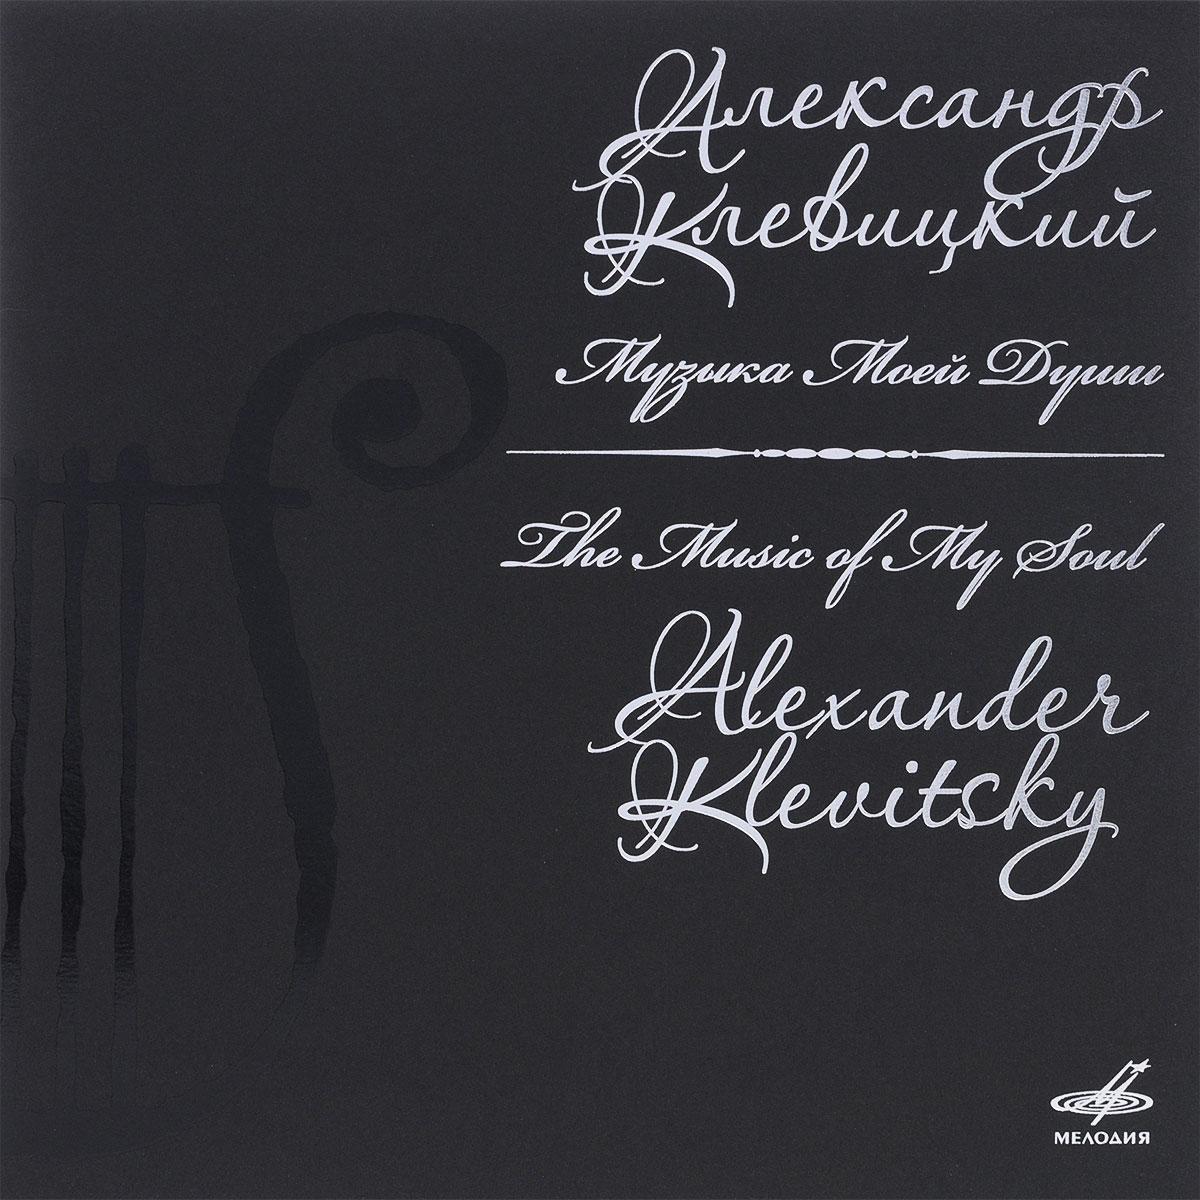 LP 1:Tracks 1 - 4LP 2:Tracks 5 - 8